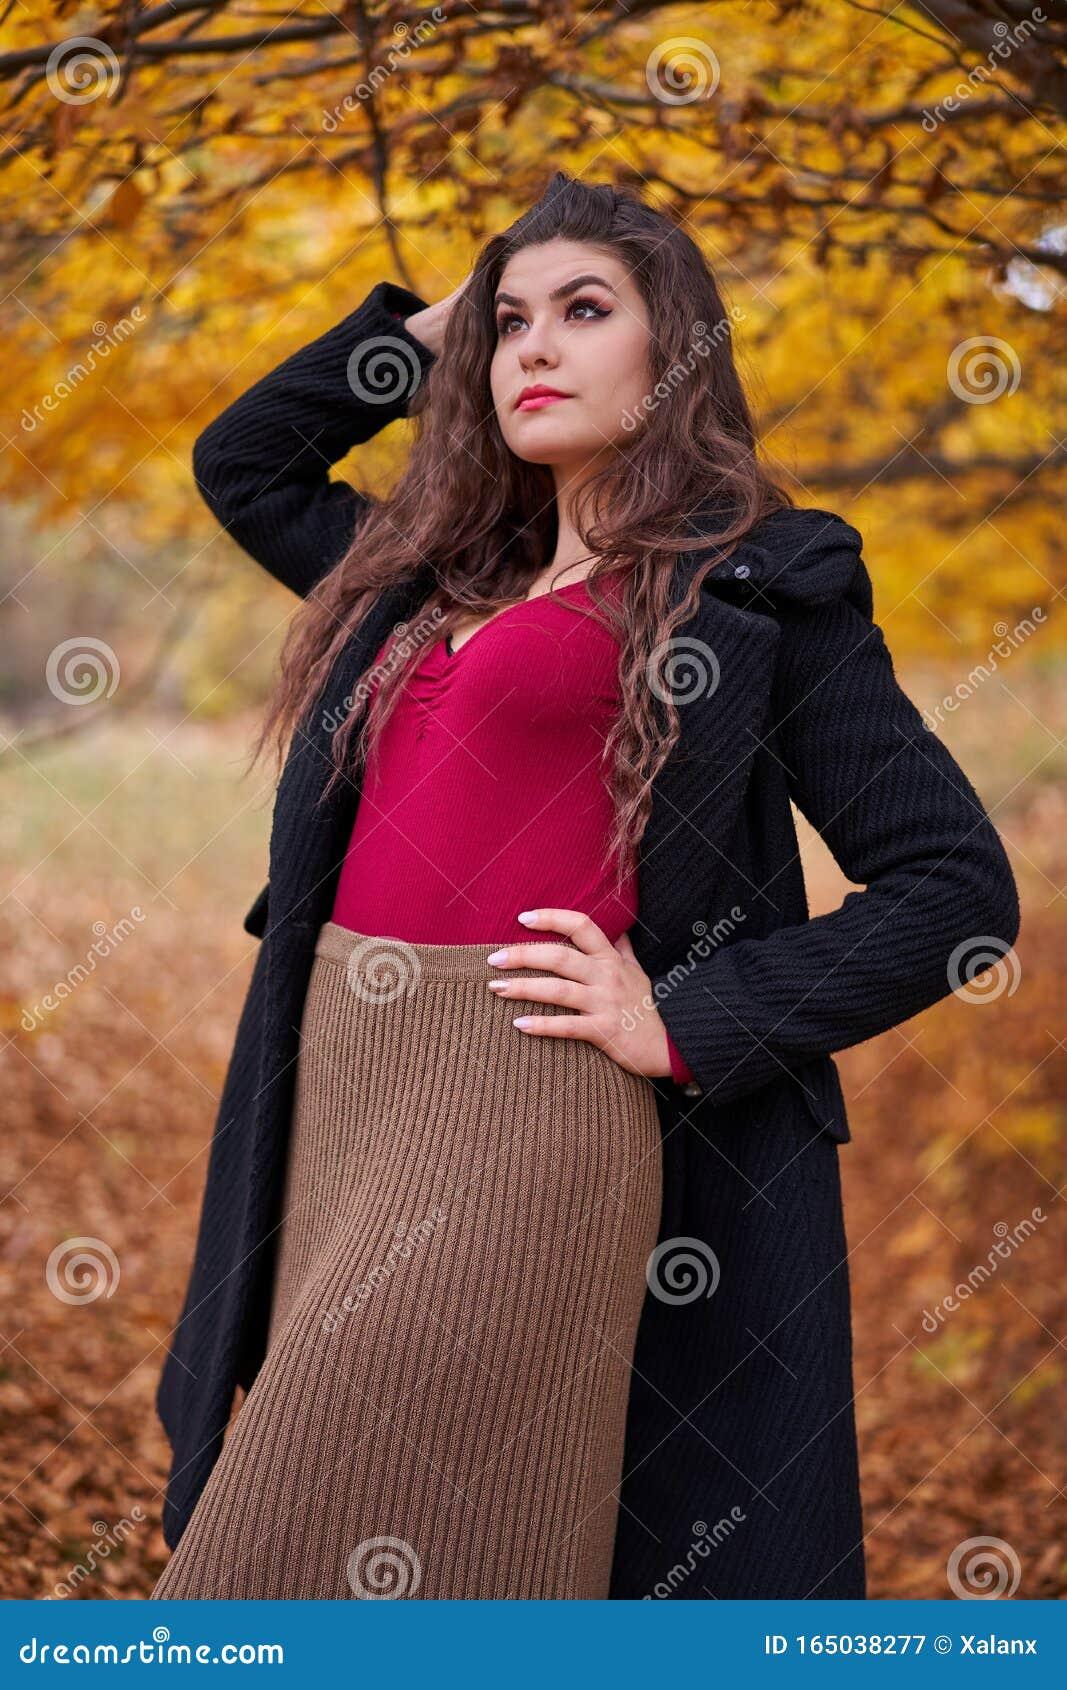 Latin women pictures of beautiful 13 Drop